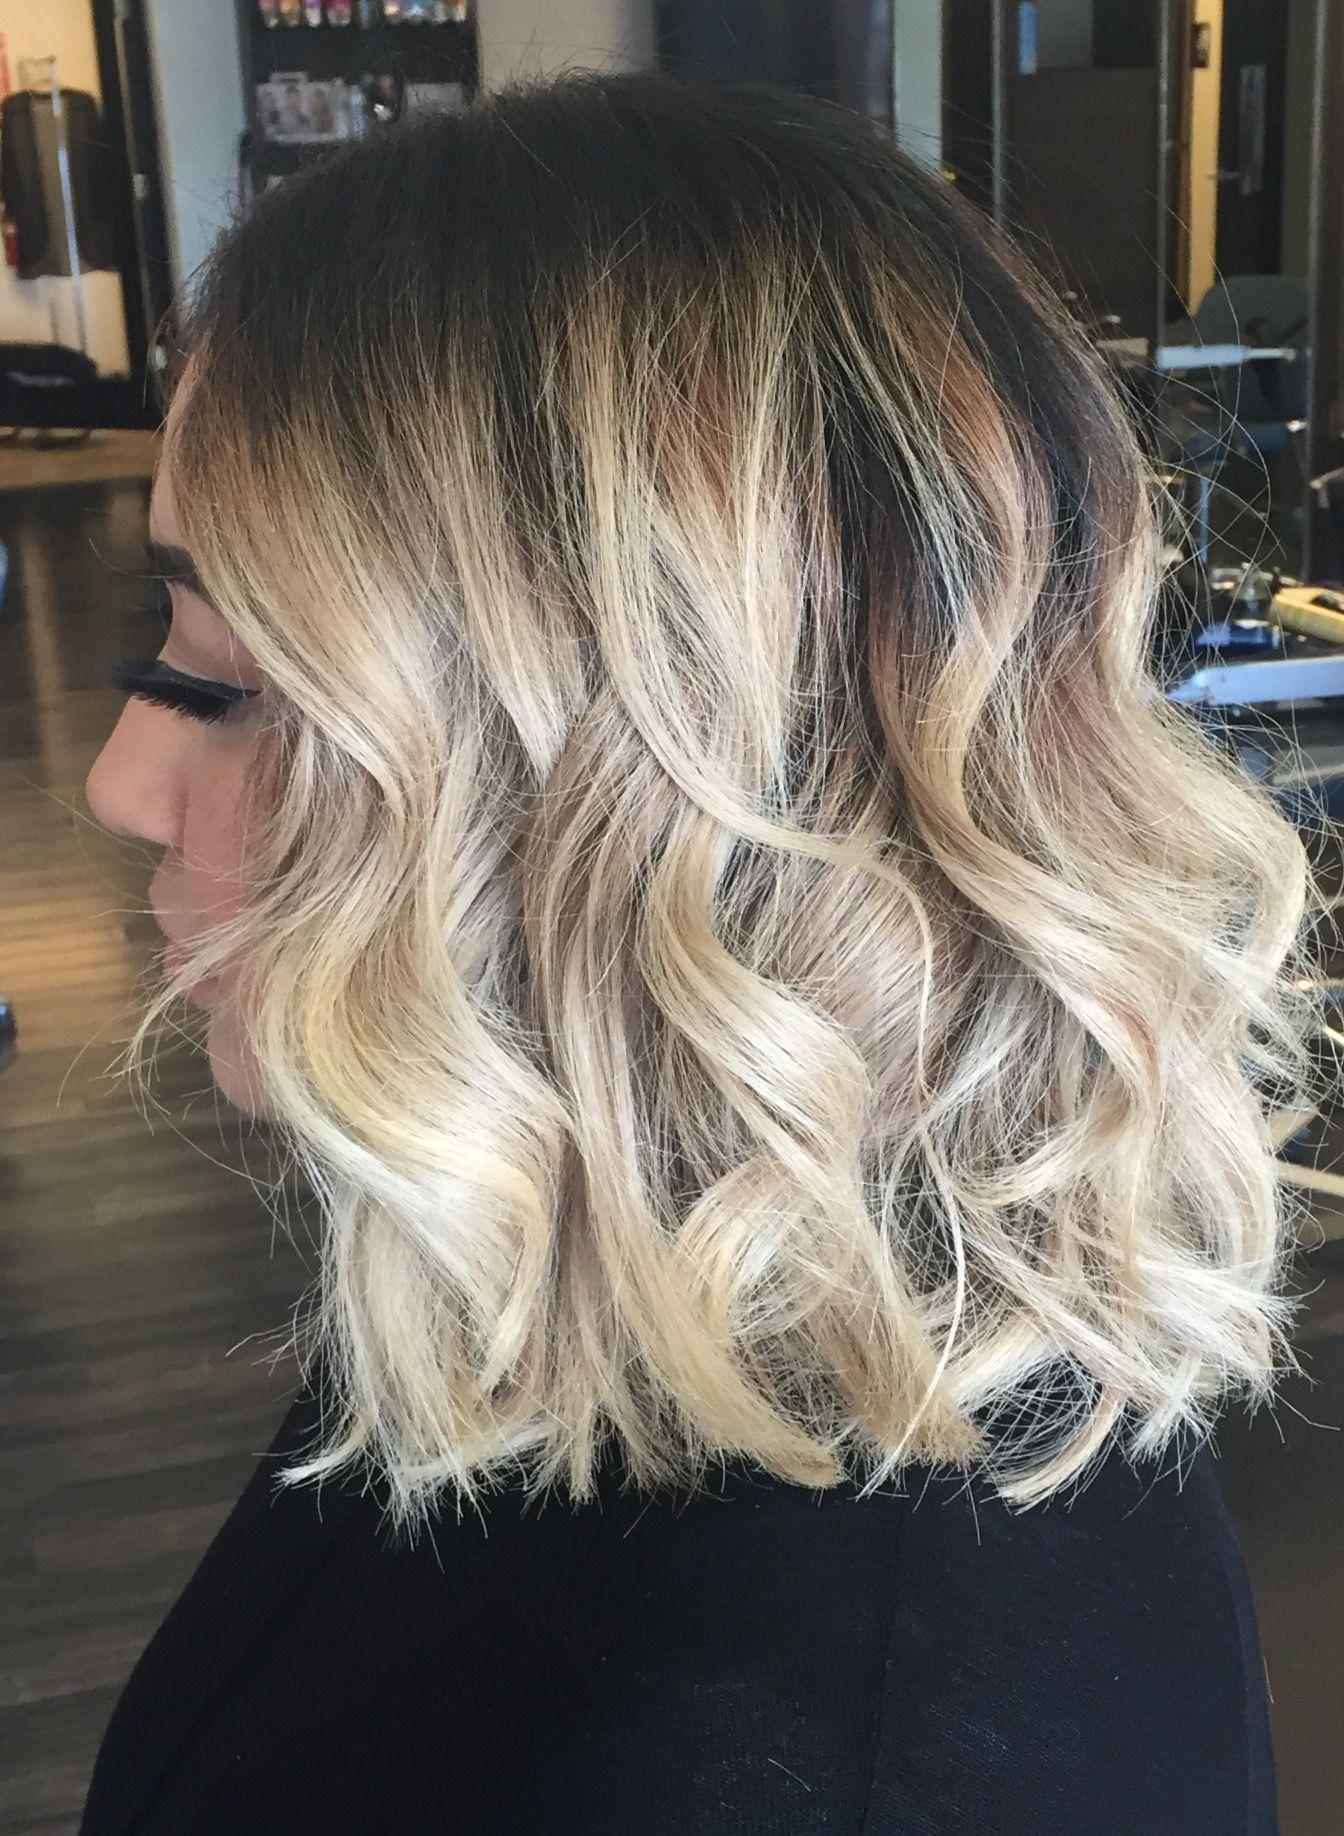 Balayage Ombre Highlights On Short Hair Long Bob Lob Blonde With Dark Root Sha Dark Hair With Highlights Blonde Hair With Roots Dark Roots Blonde Hair Short